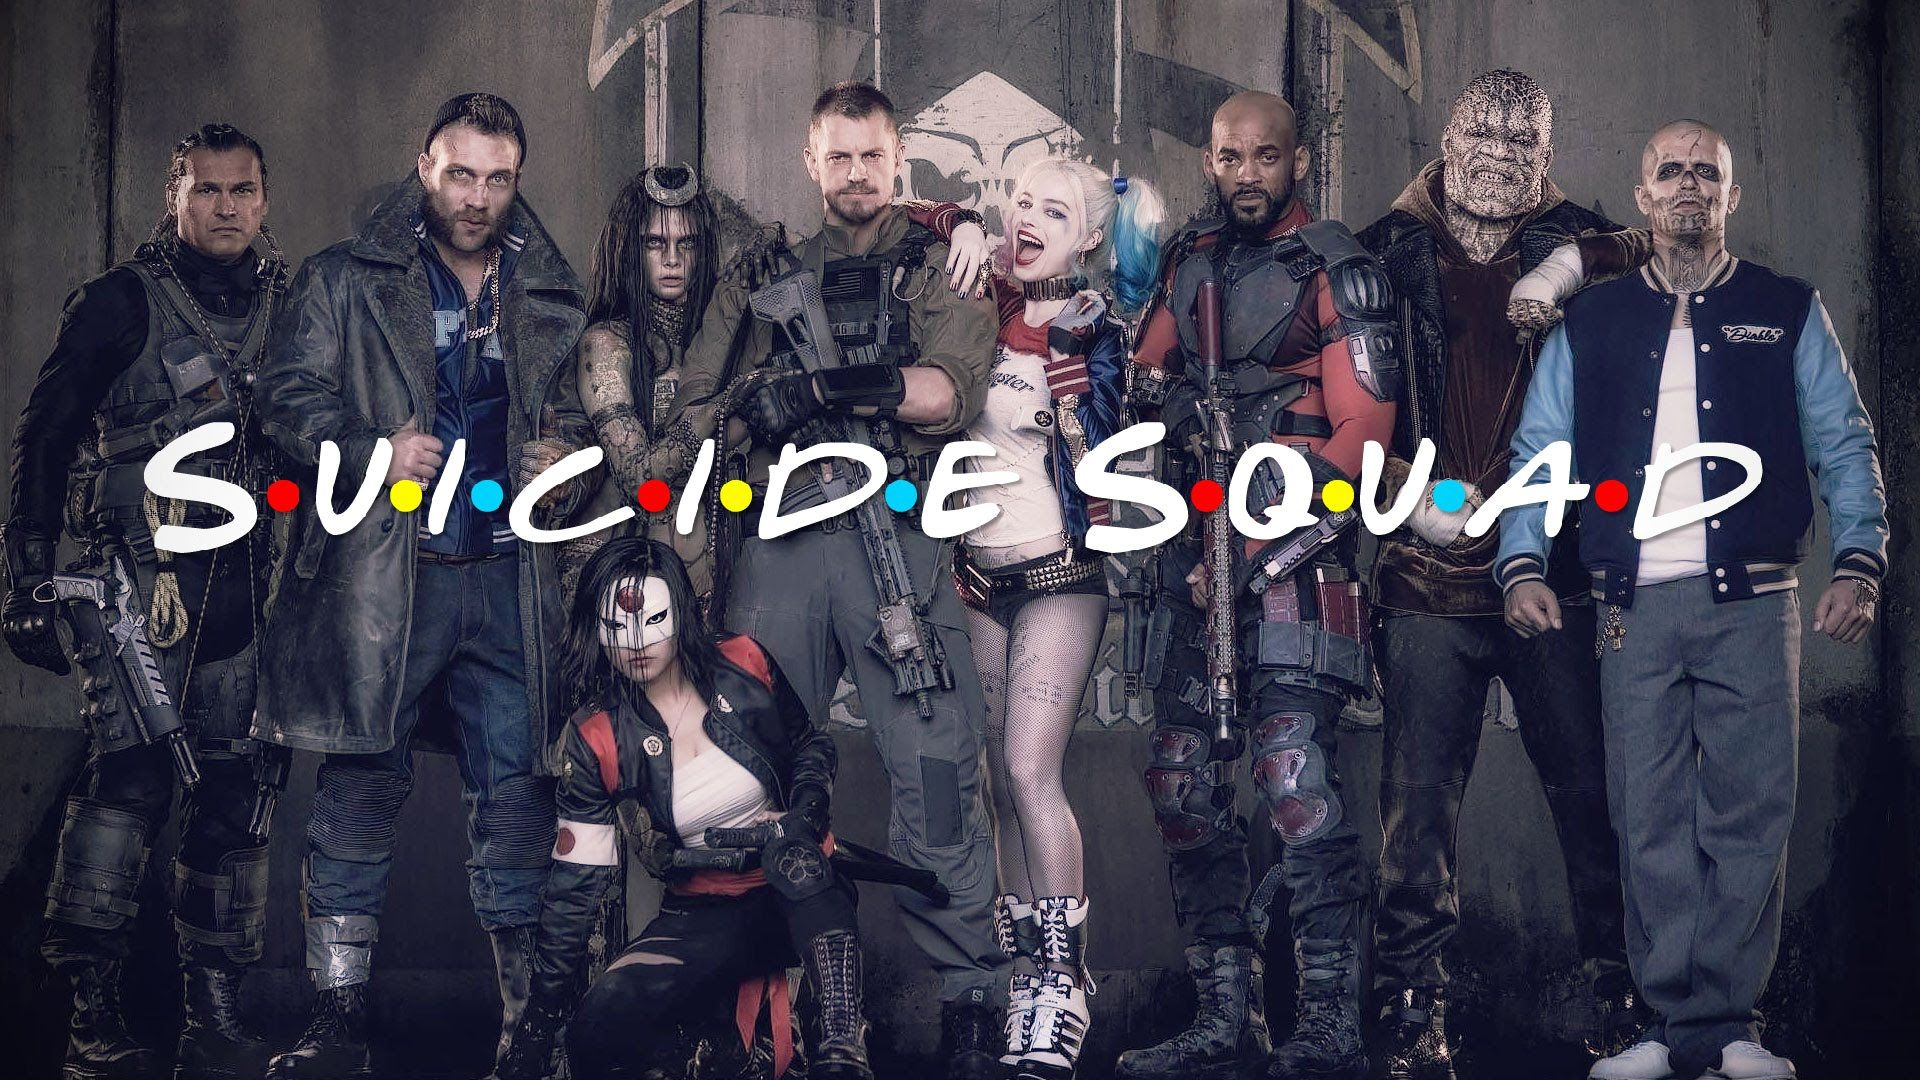 Suicide Squad, Cool HD Wallpaper